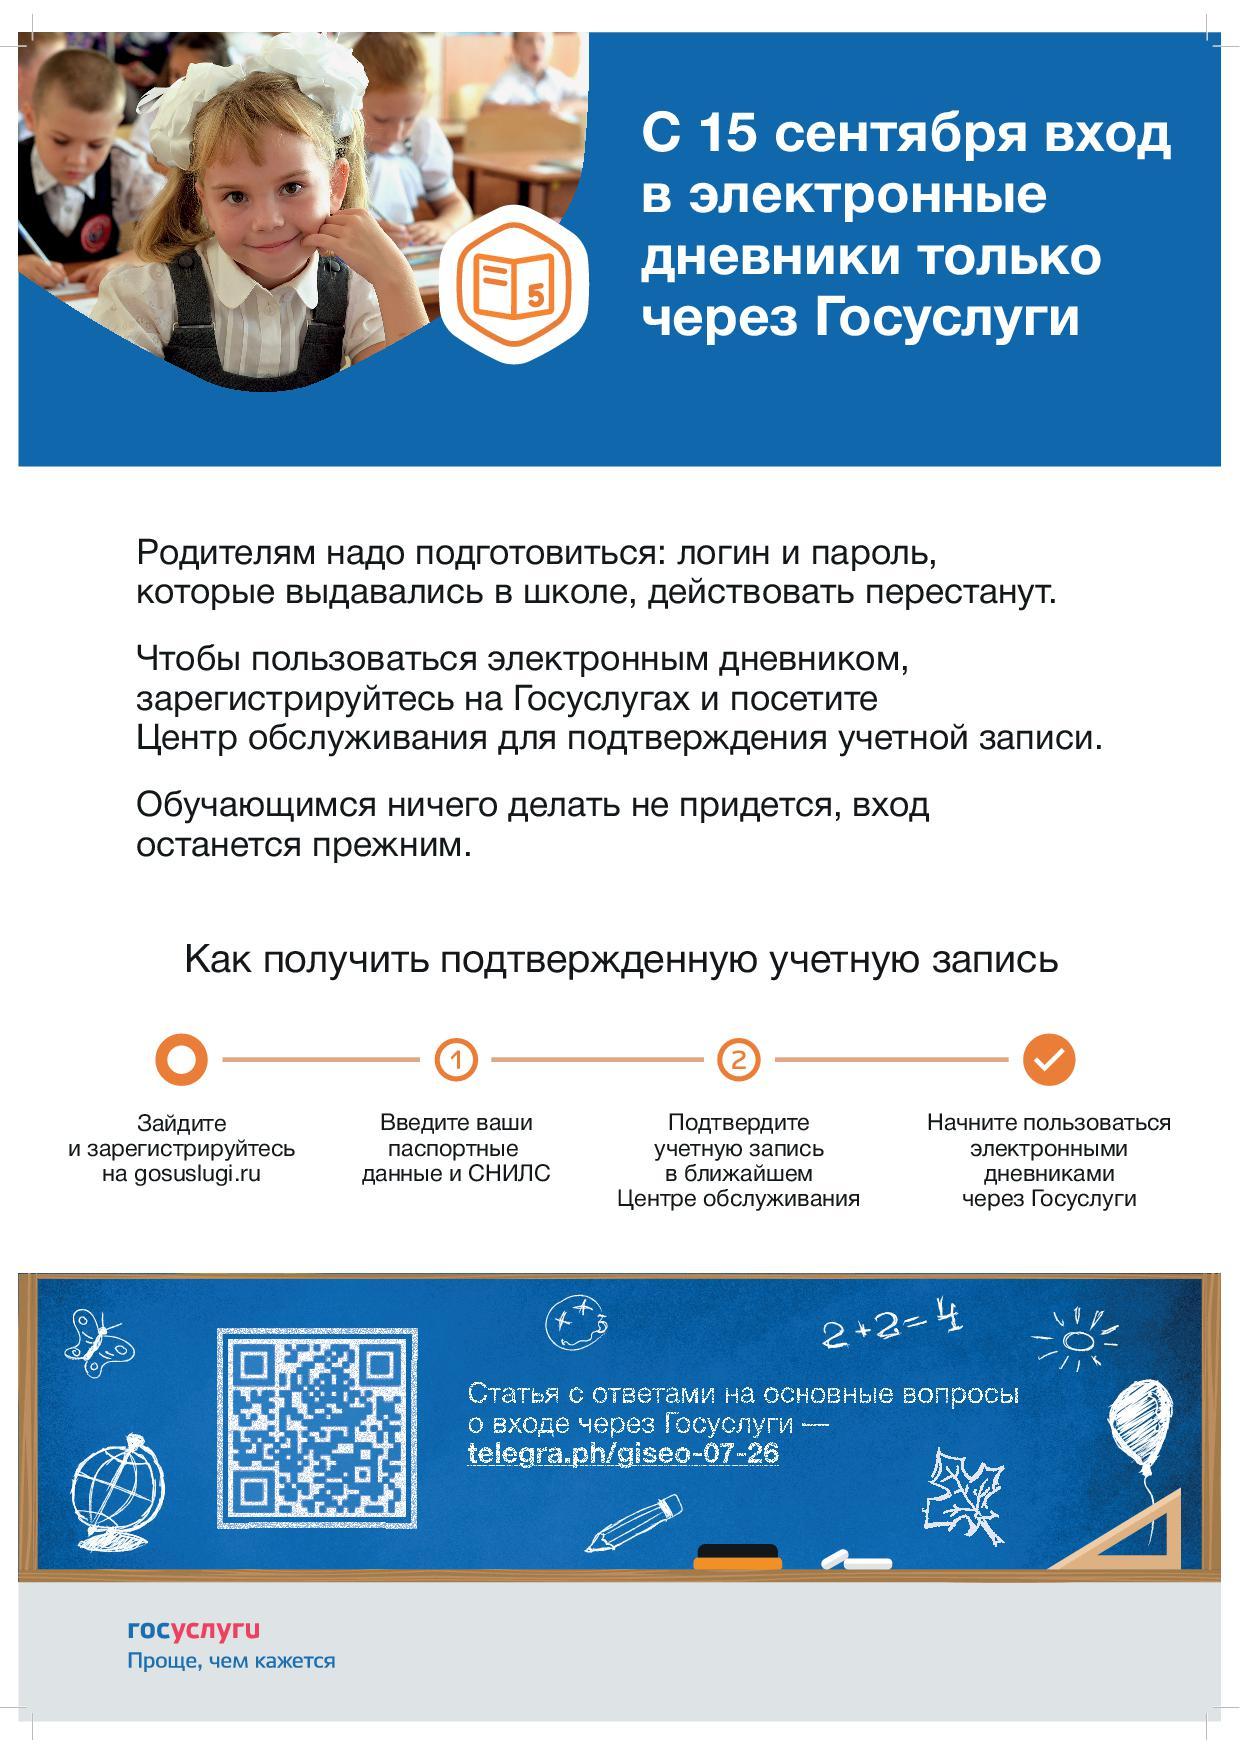 МАОУ Гимназия № 1 Дети Инвалиды Плакат